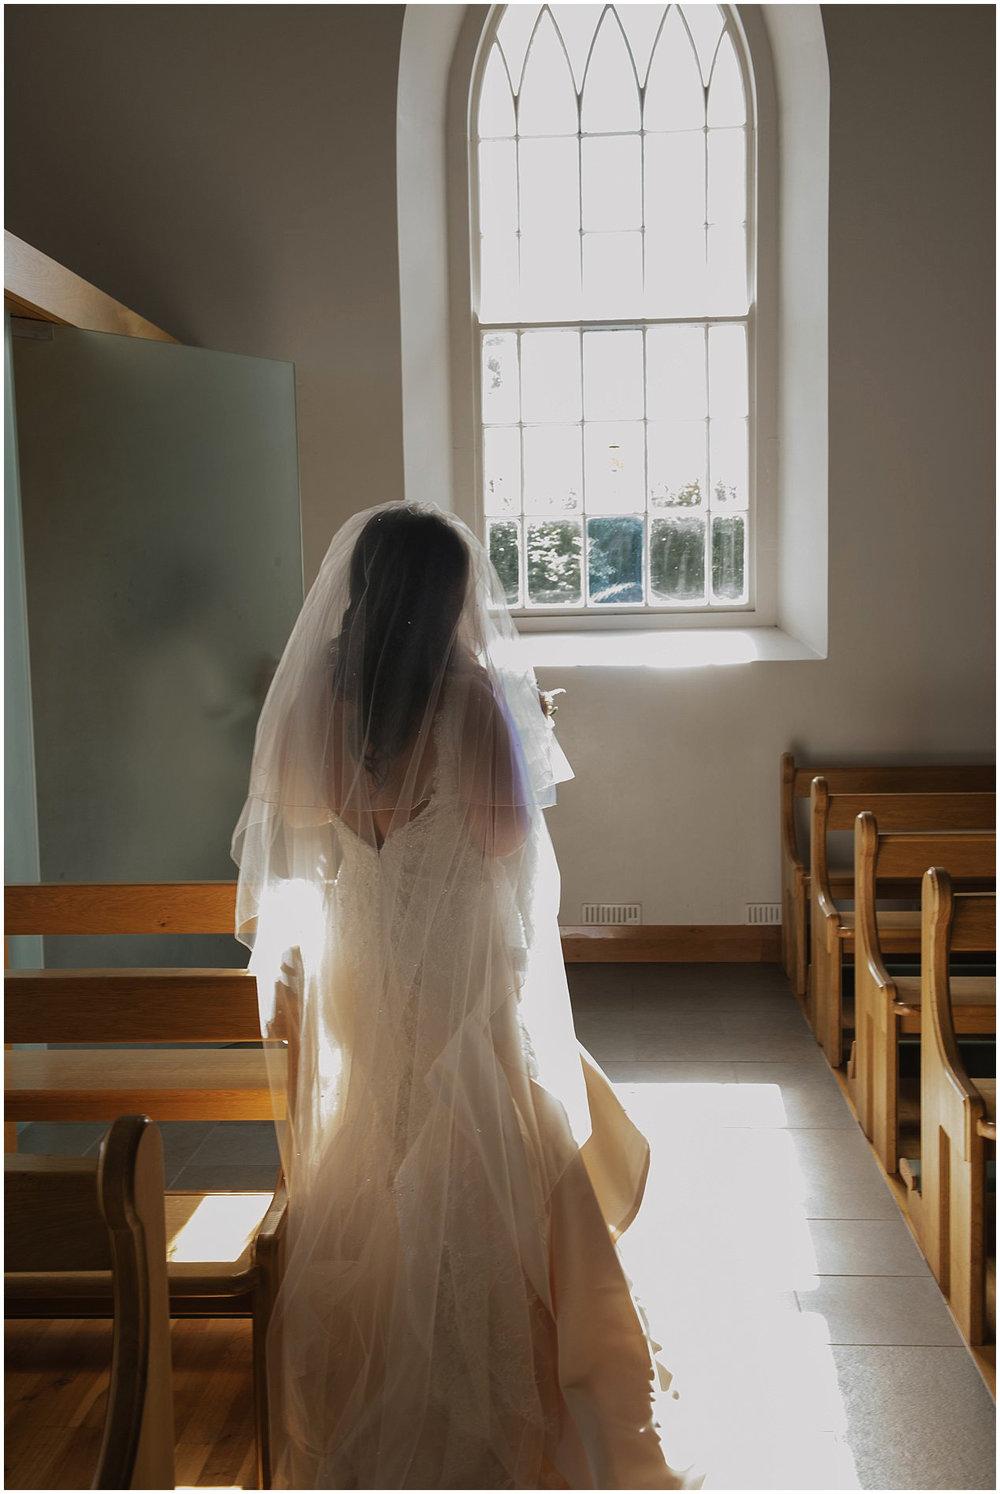 Shauneen_PJ_Hillgrove_Hotel_Monaghan_Wedding_jude_browne_photography_0047.jpg